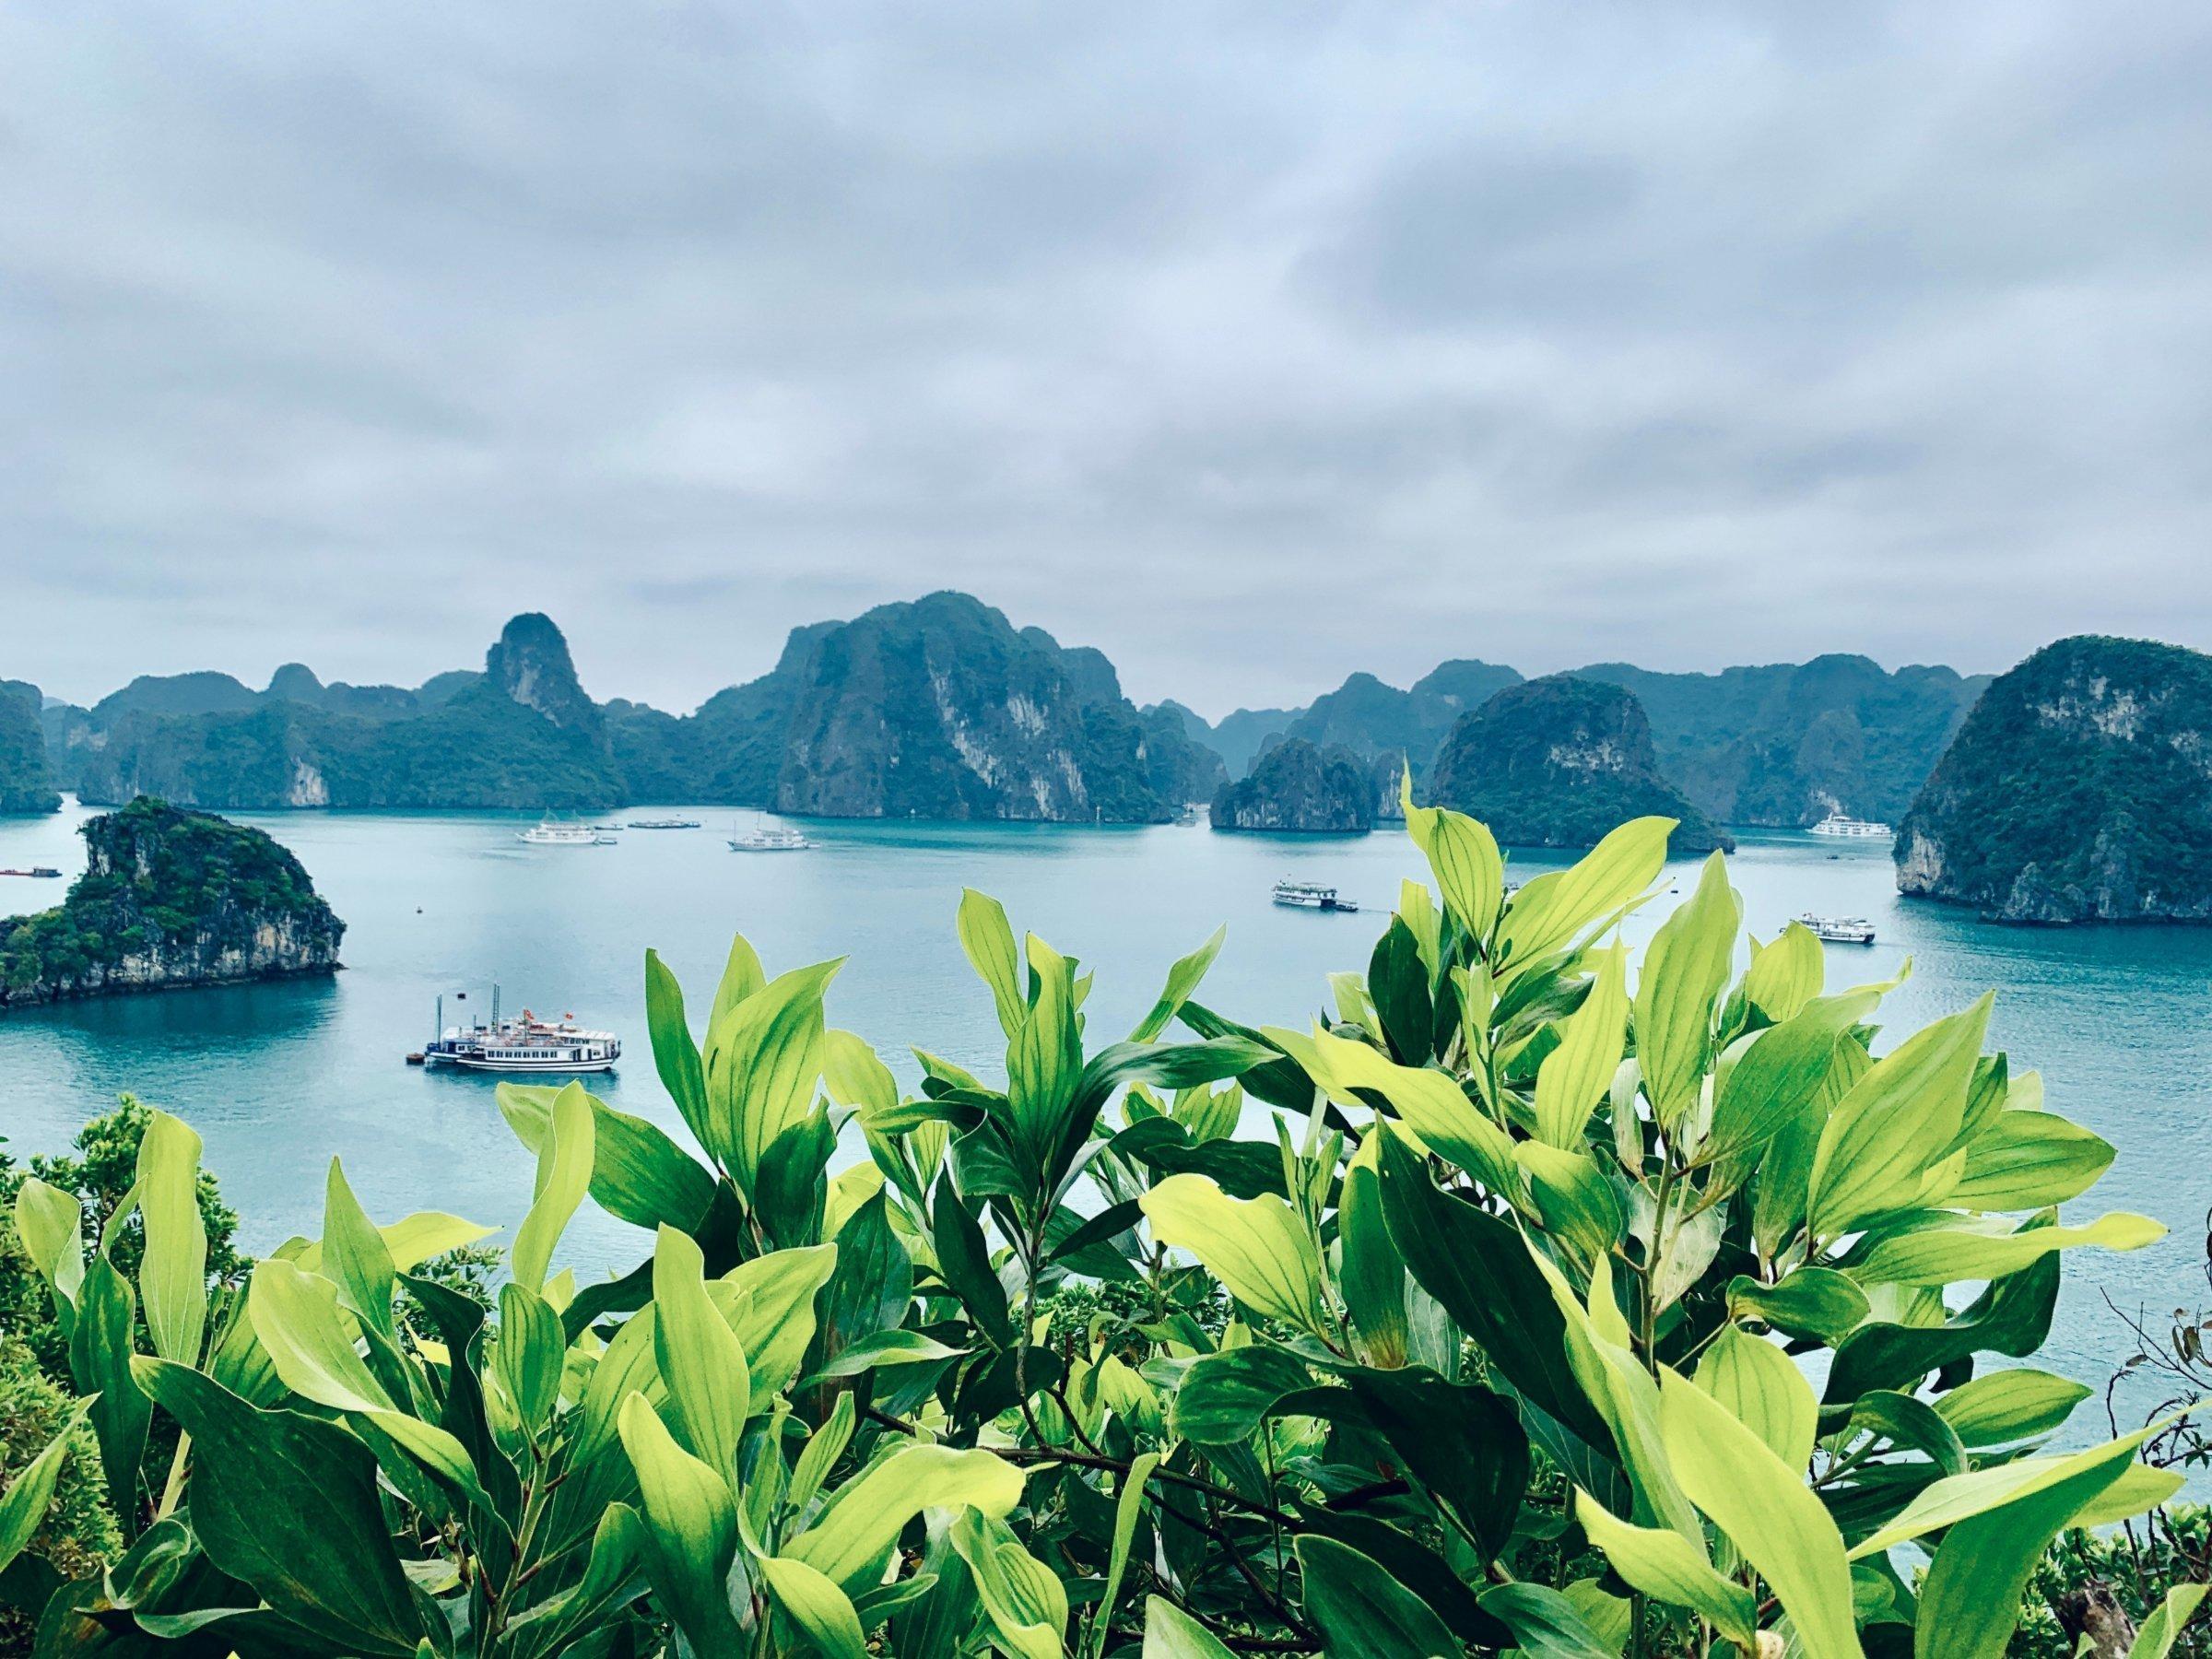 14-Day Luxury Family Holiday In Vietnam - Vietnam Itinerary